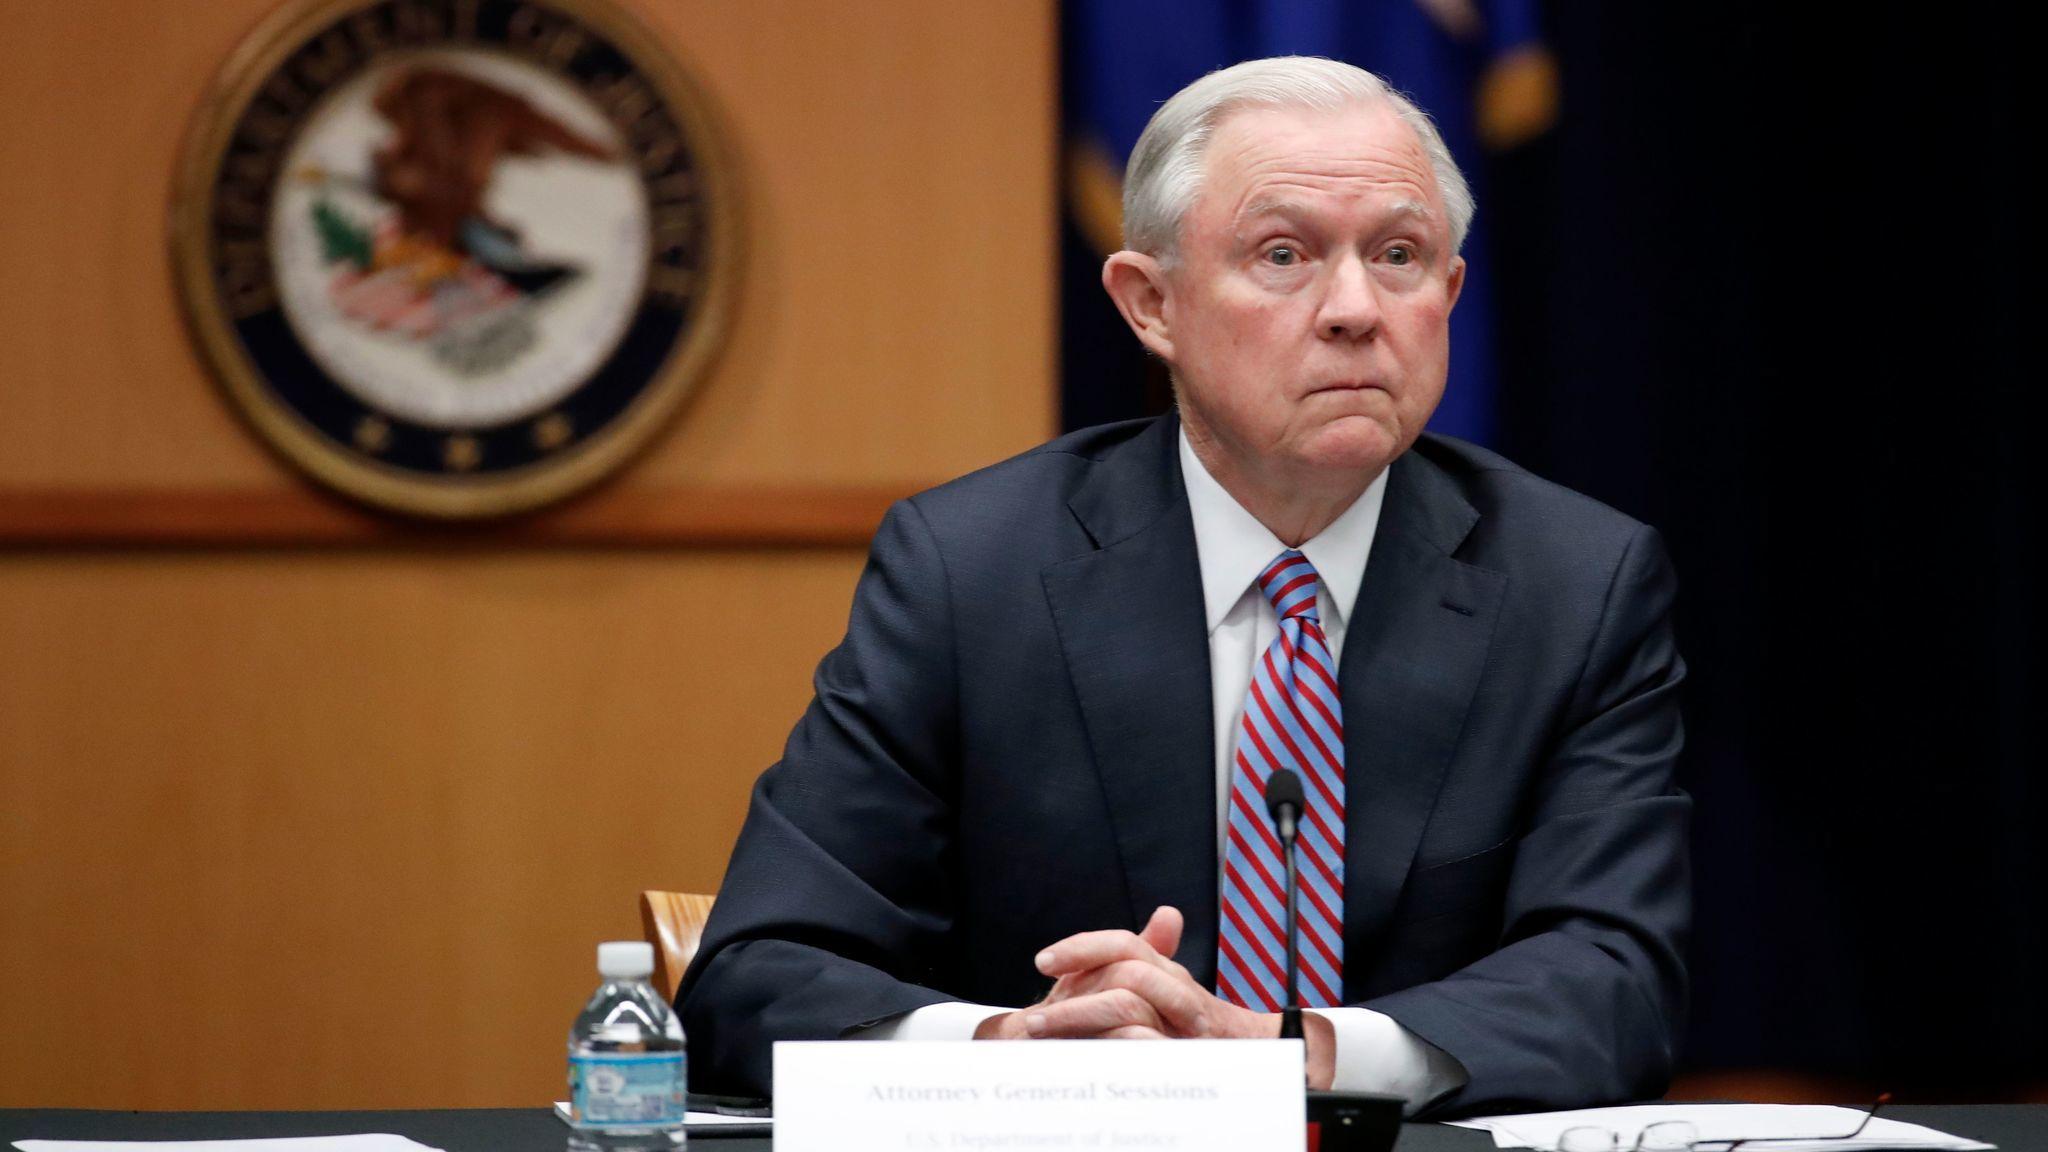 Sessions orders return to tough drug war policies that trigger mandatory minimum sentences